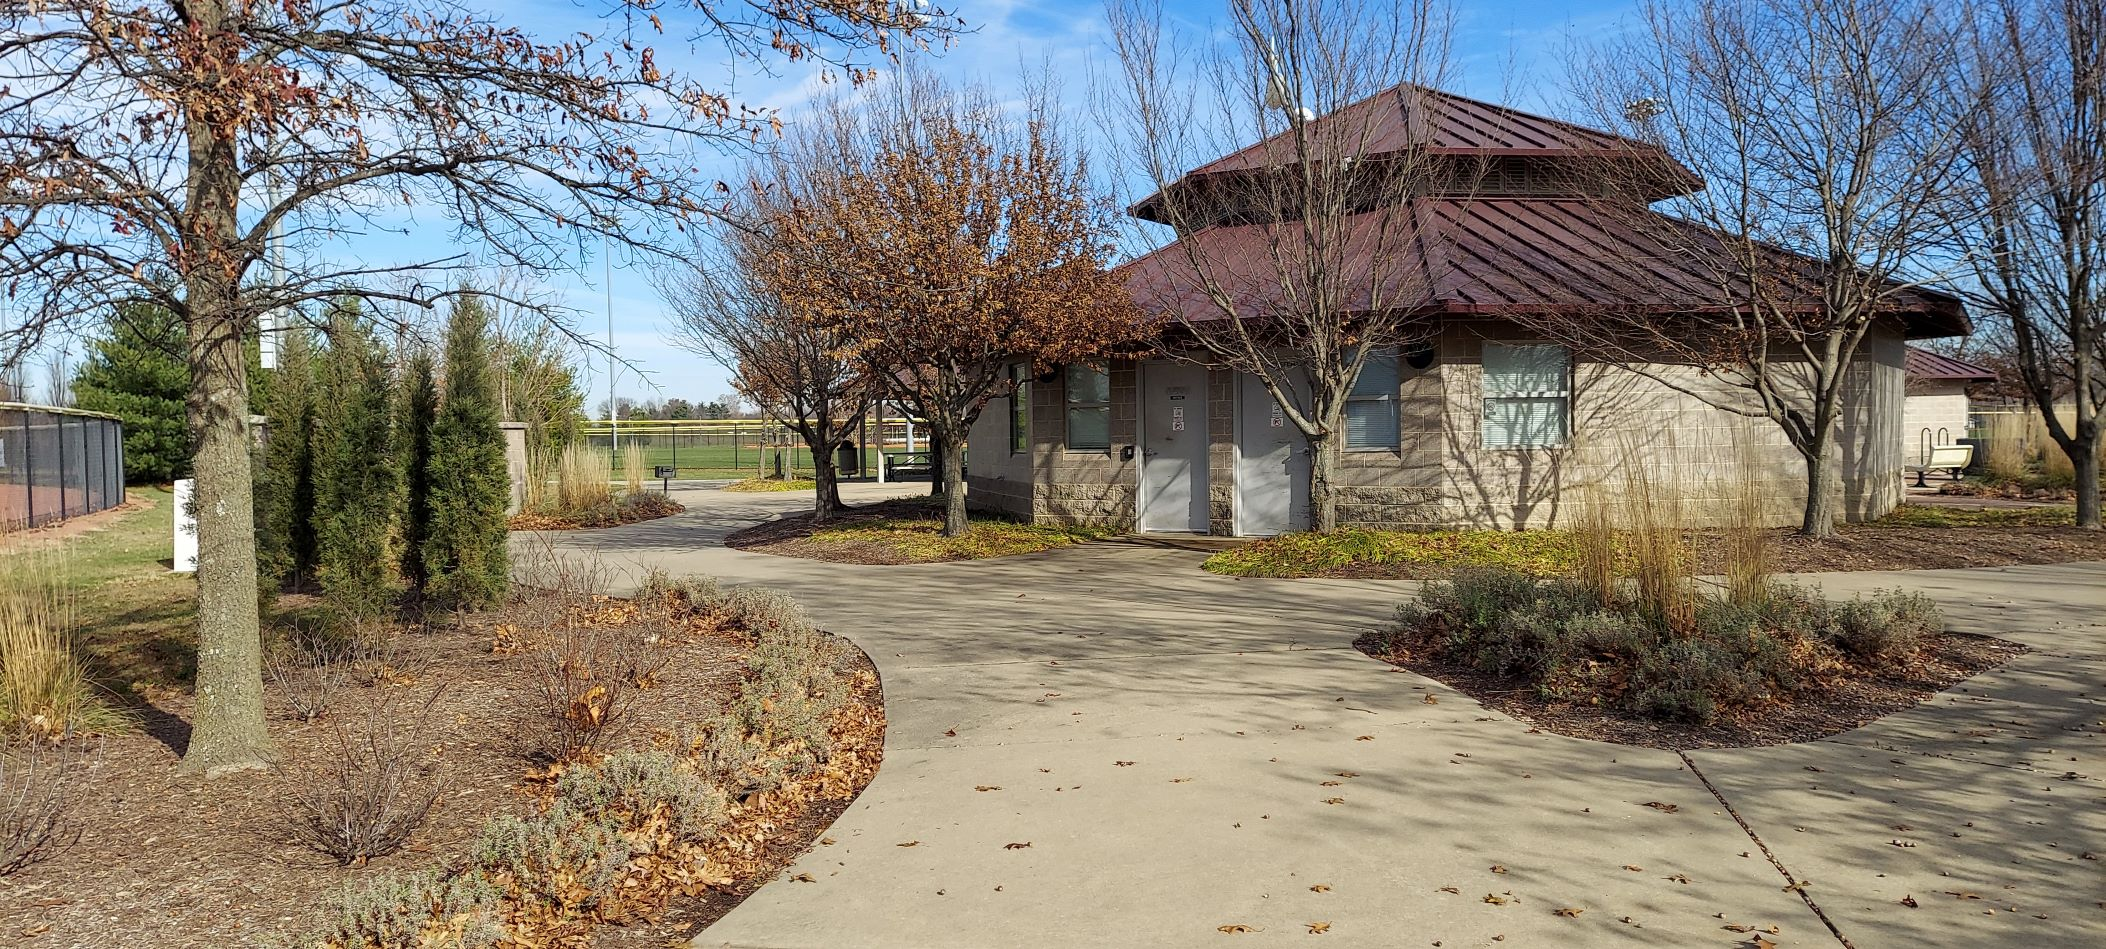 O'Fallon Family Sports Park